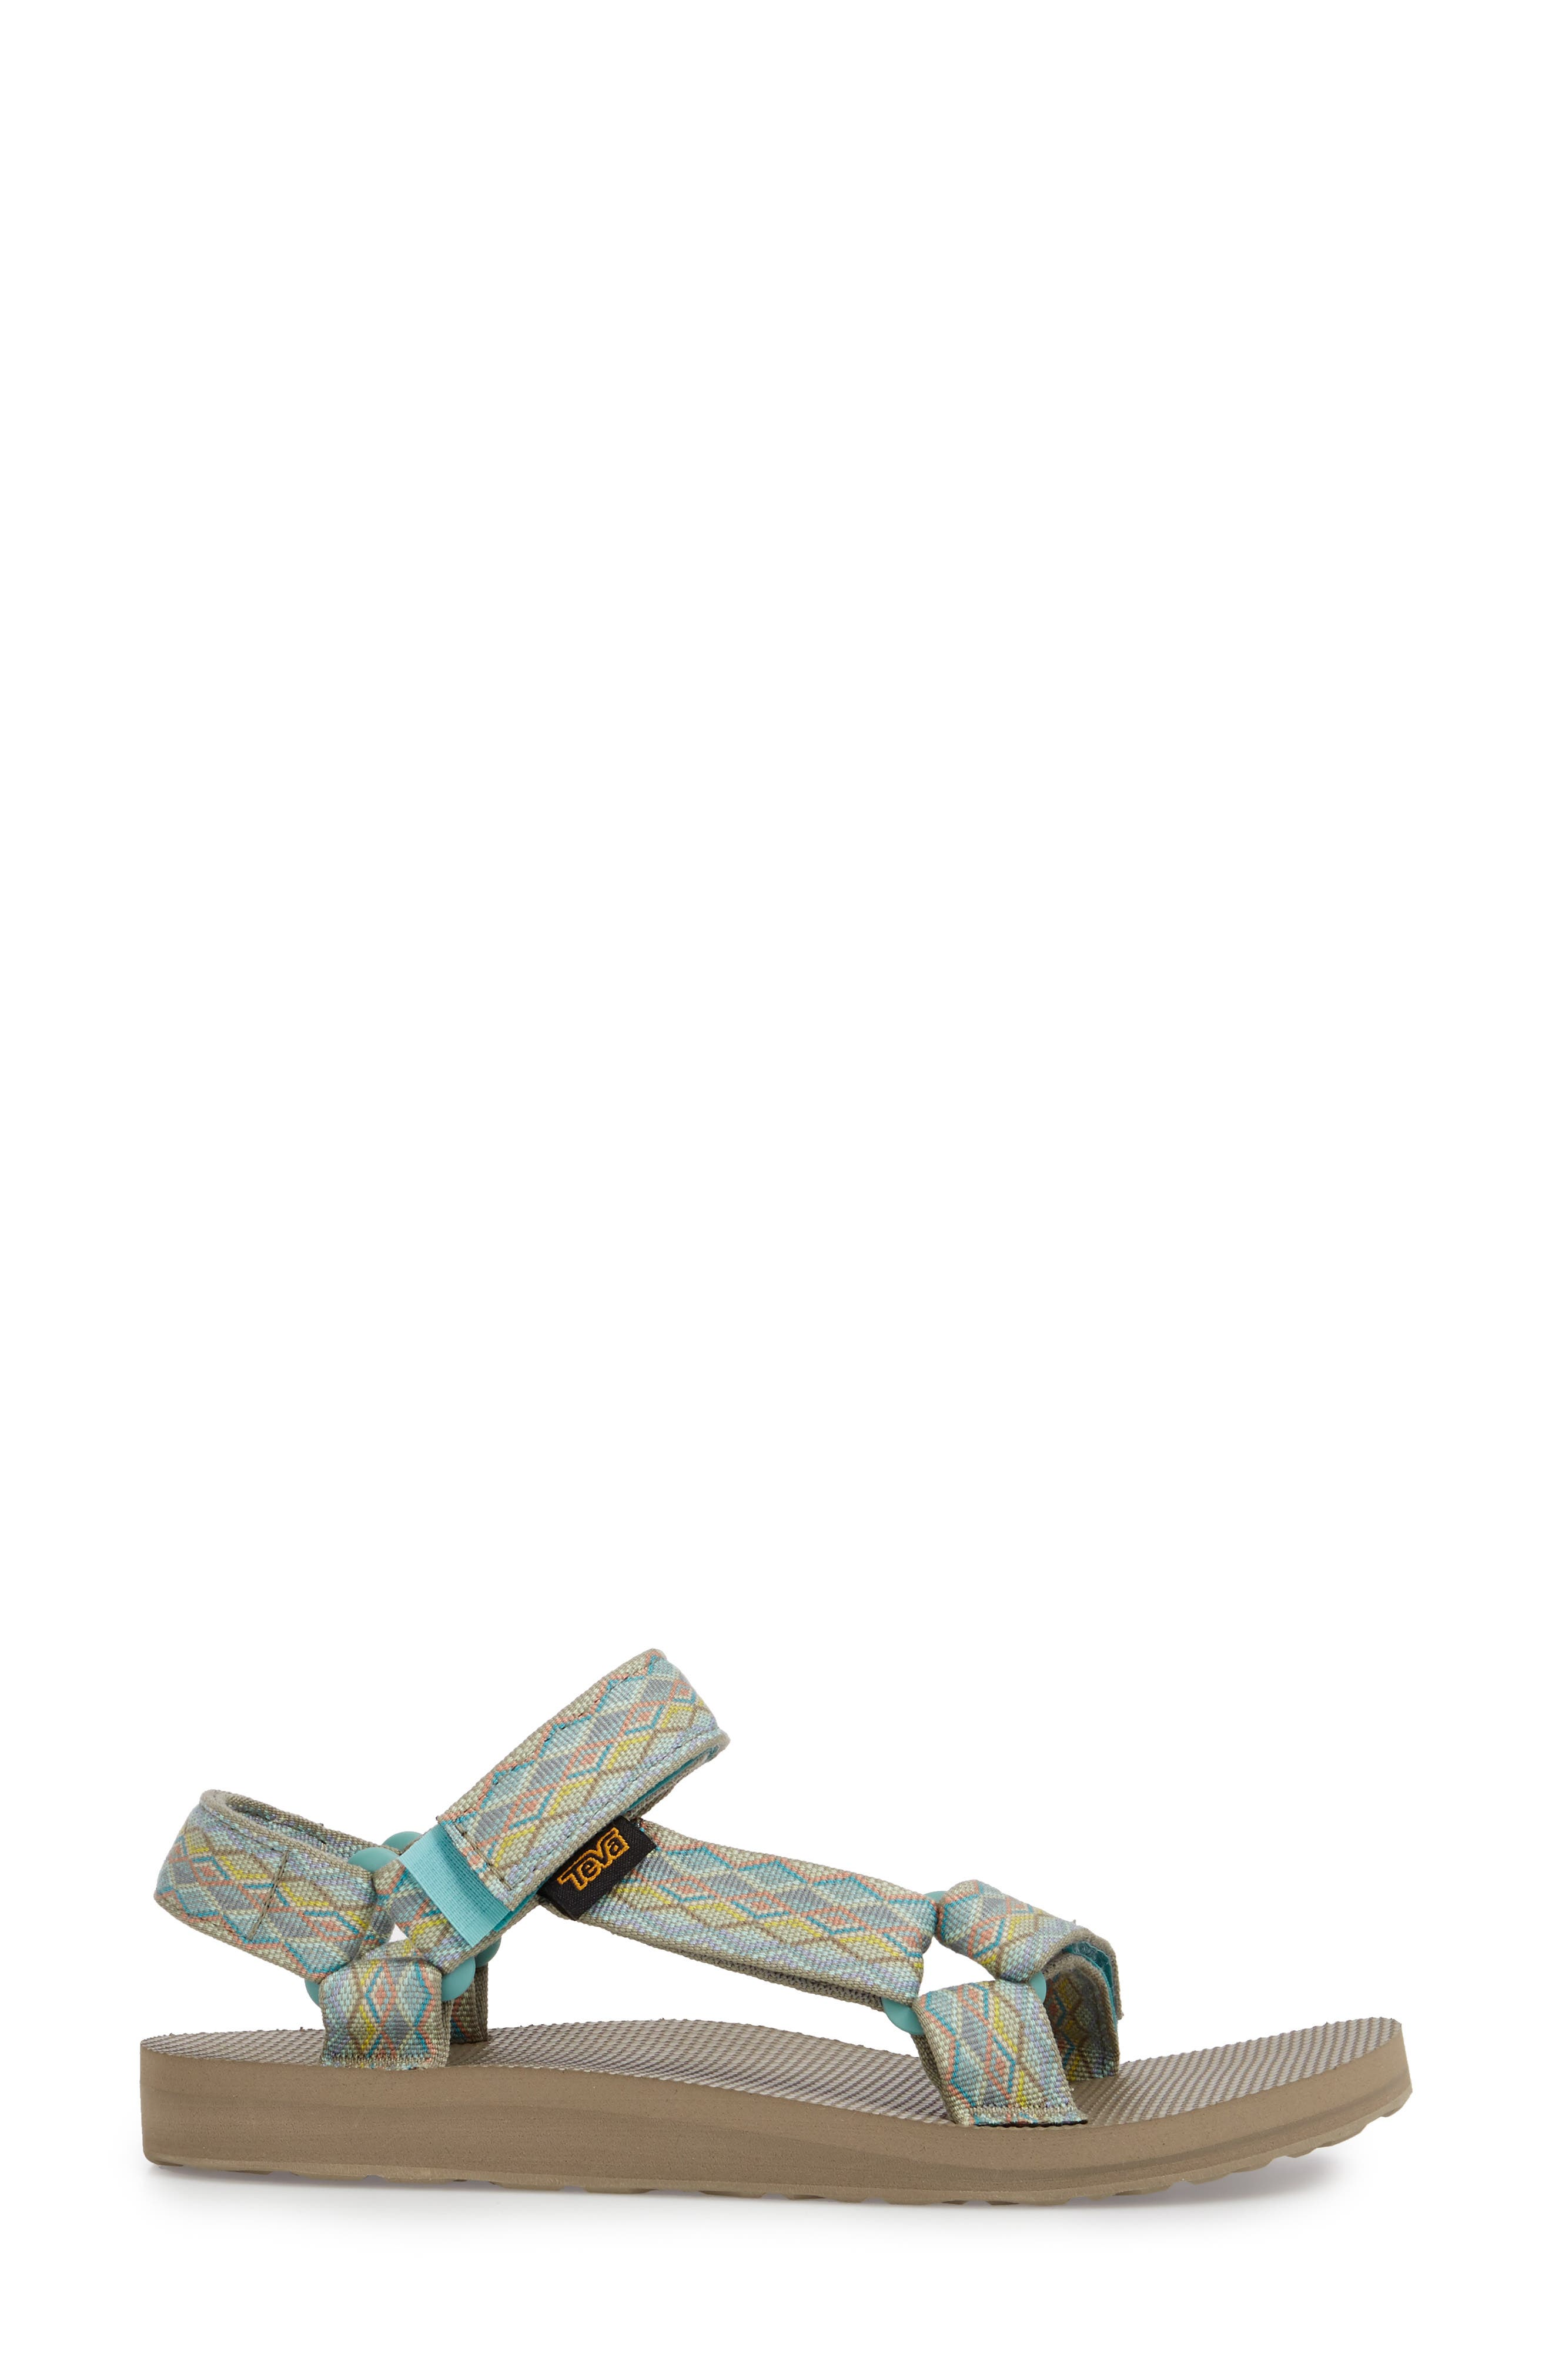 'Original Universal' Sandal,                             Alternate thumbnail 3, color,                             Mirimar Fade Sage Multi